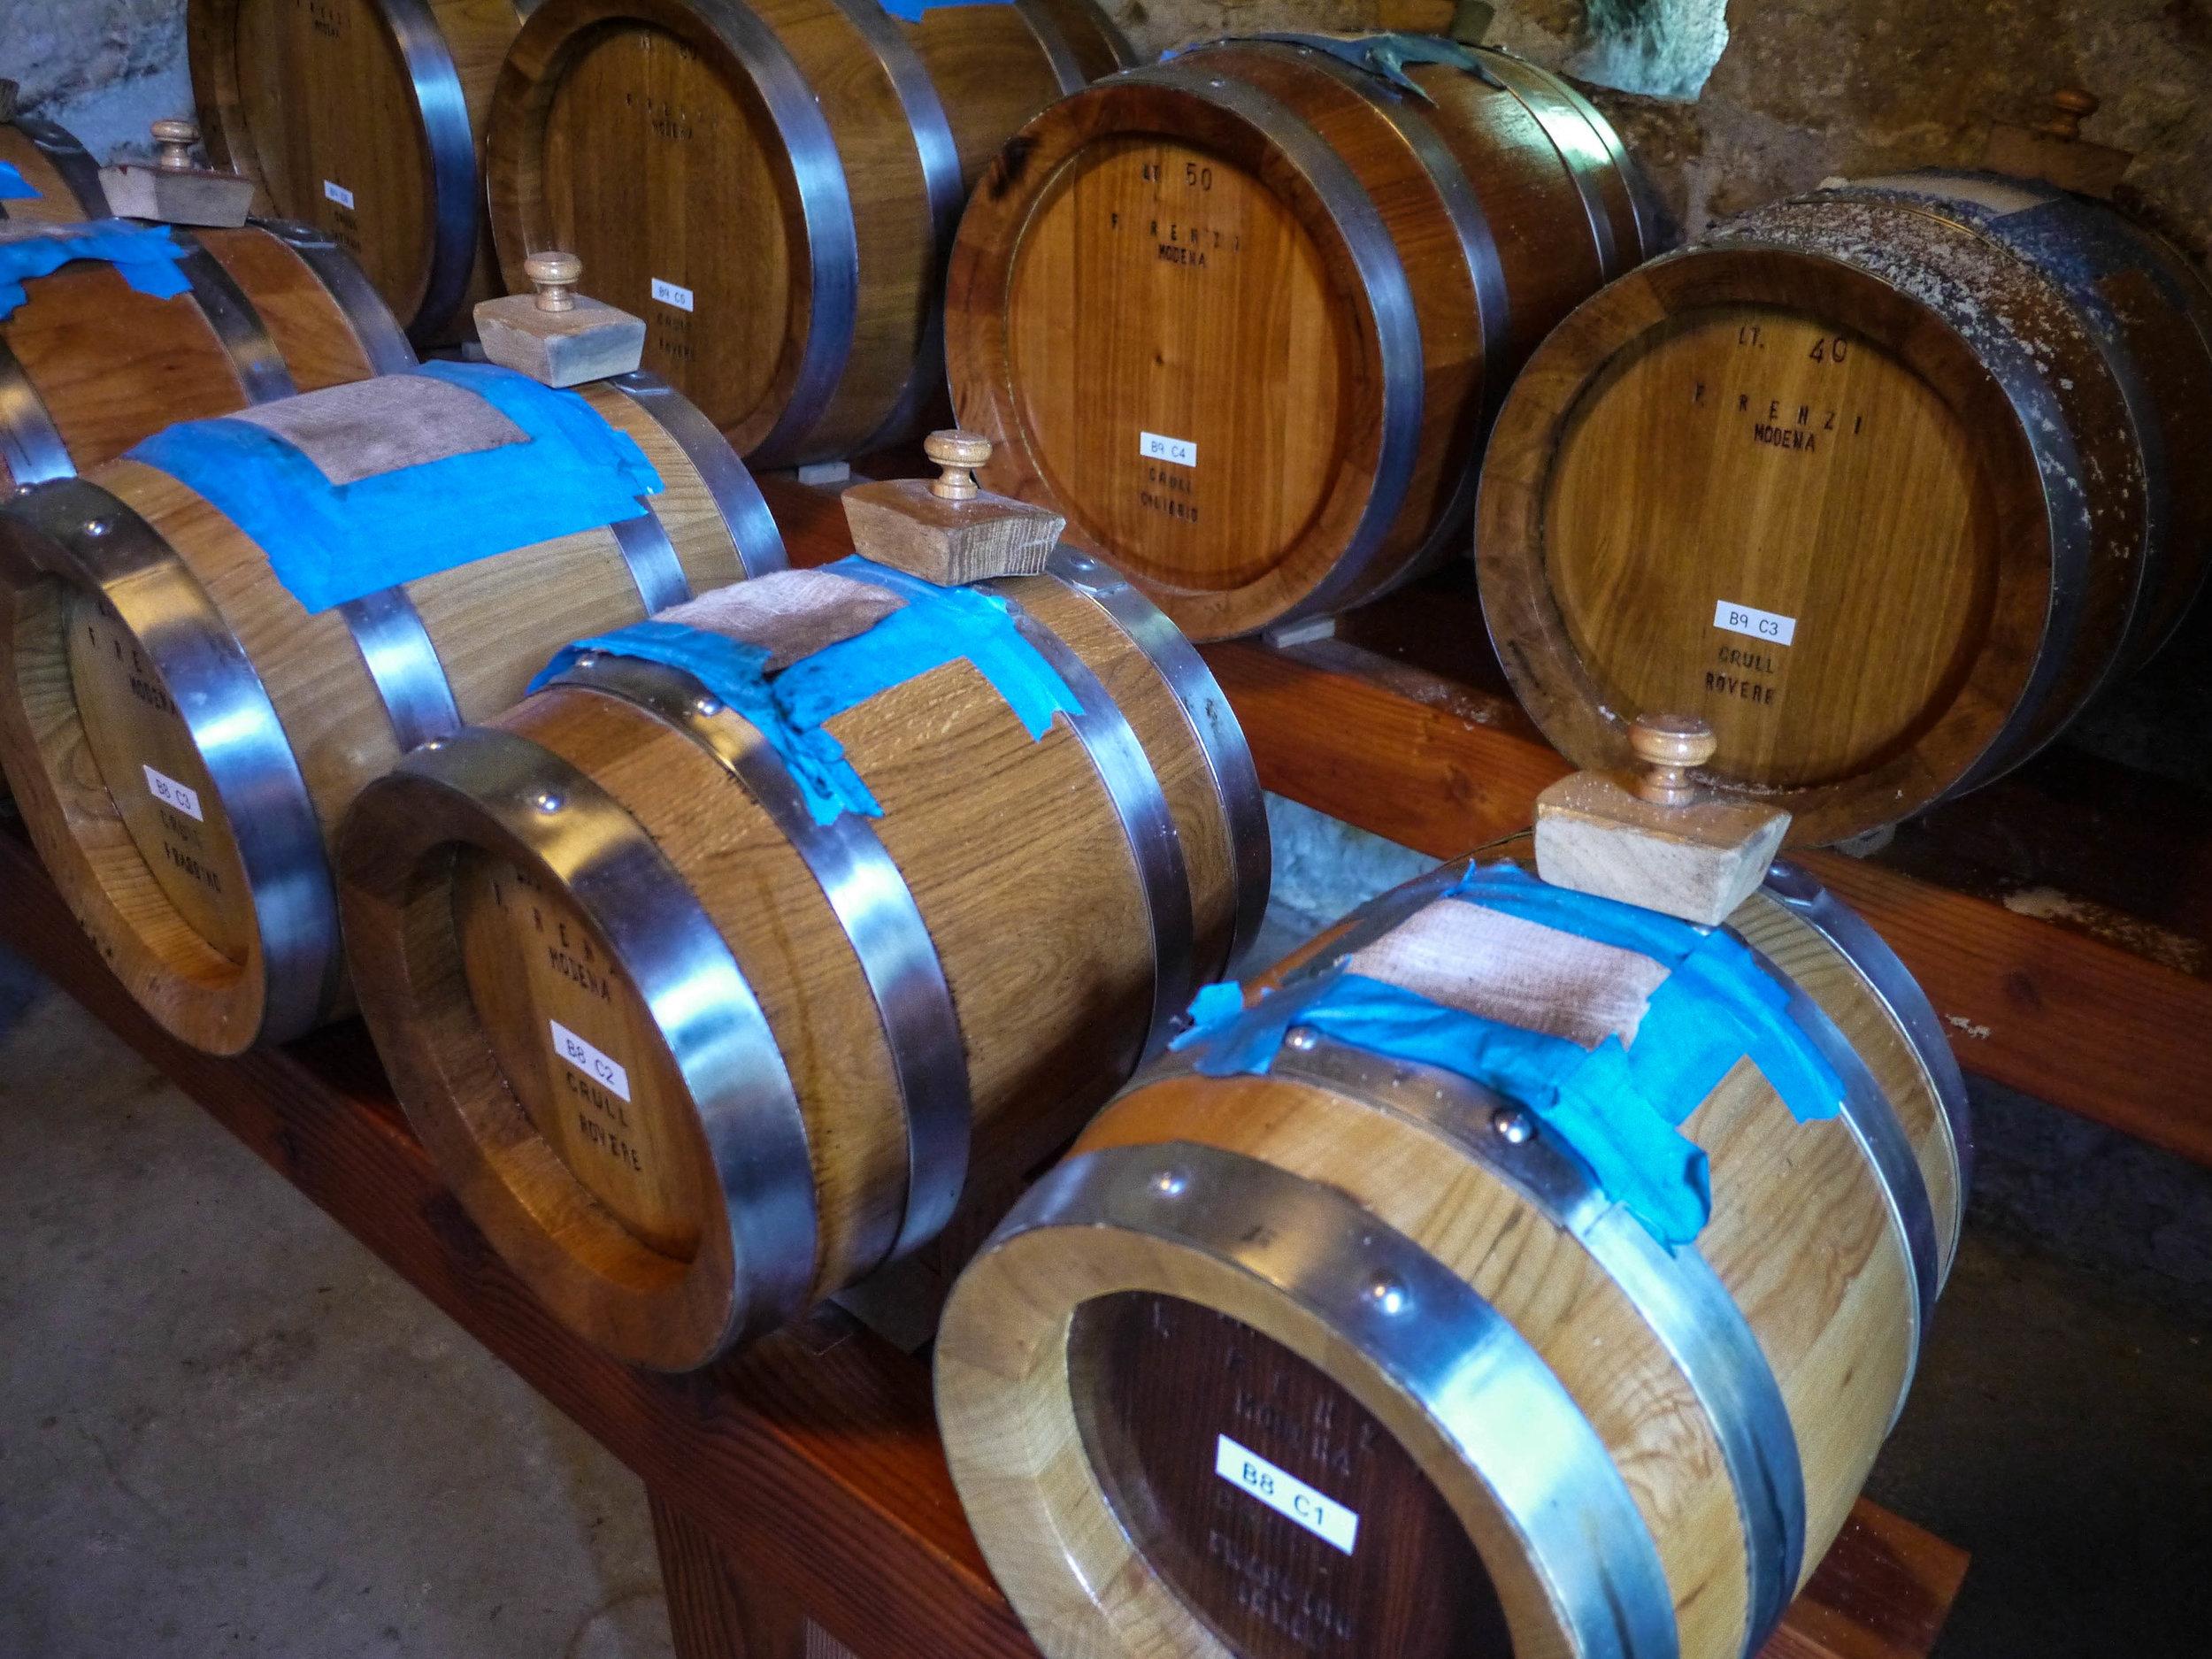 and barrels of balsamic vinegar.